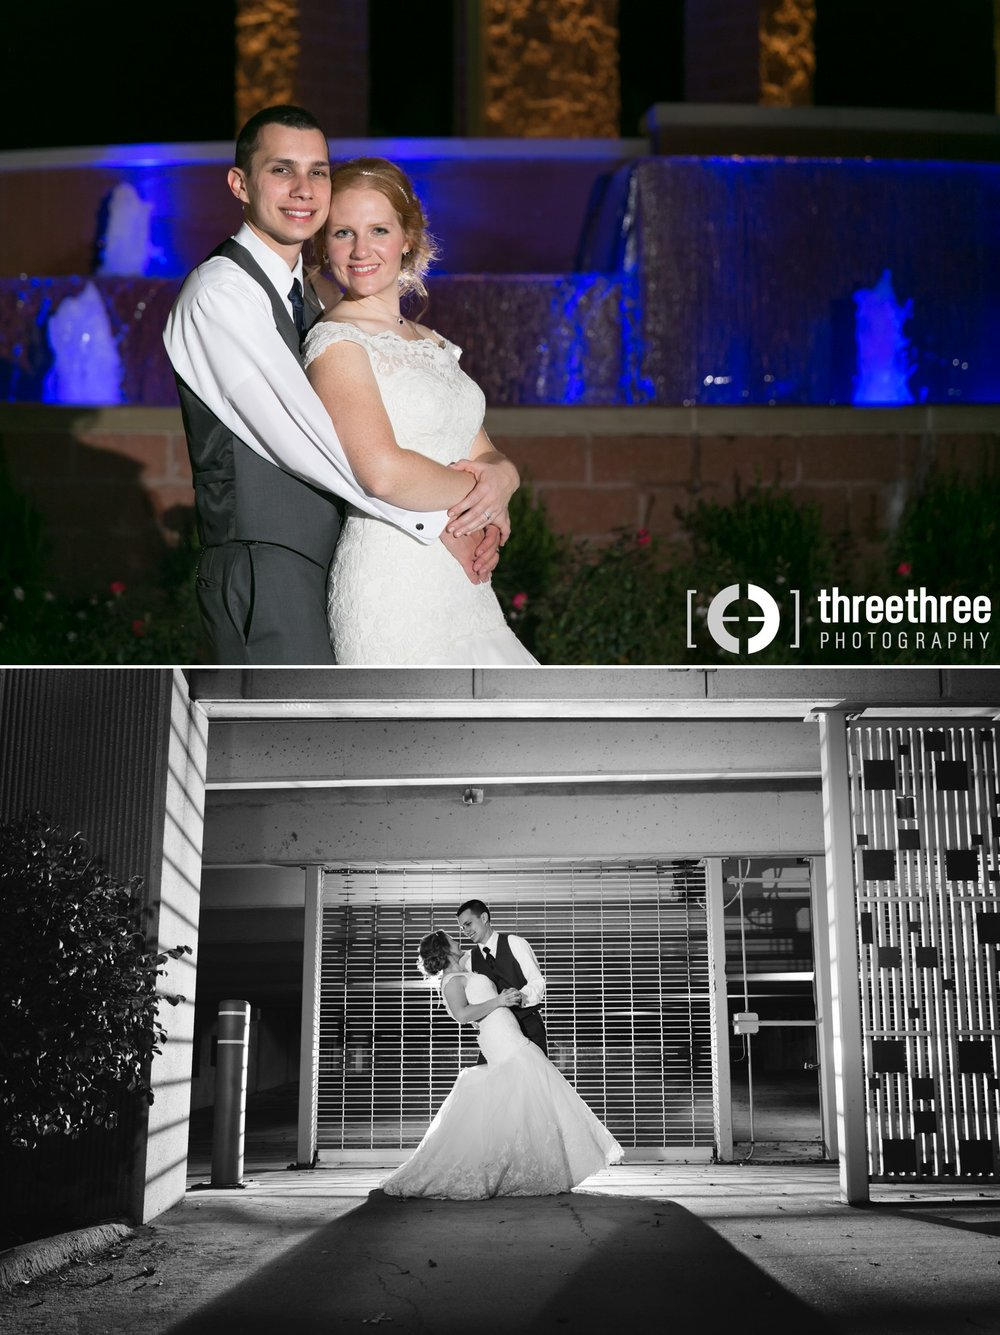 Temerity_KC Wedding Photography 10.jpg